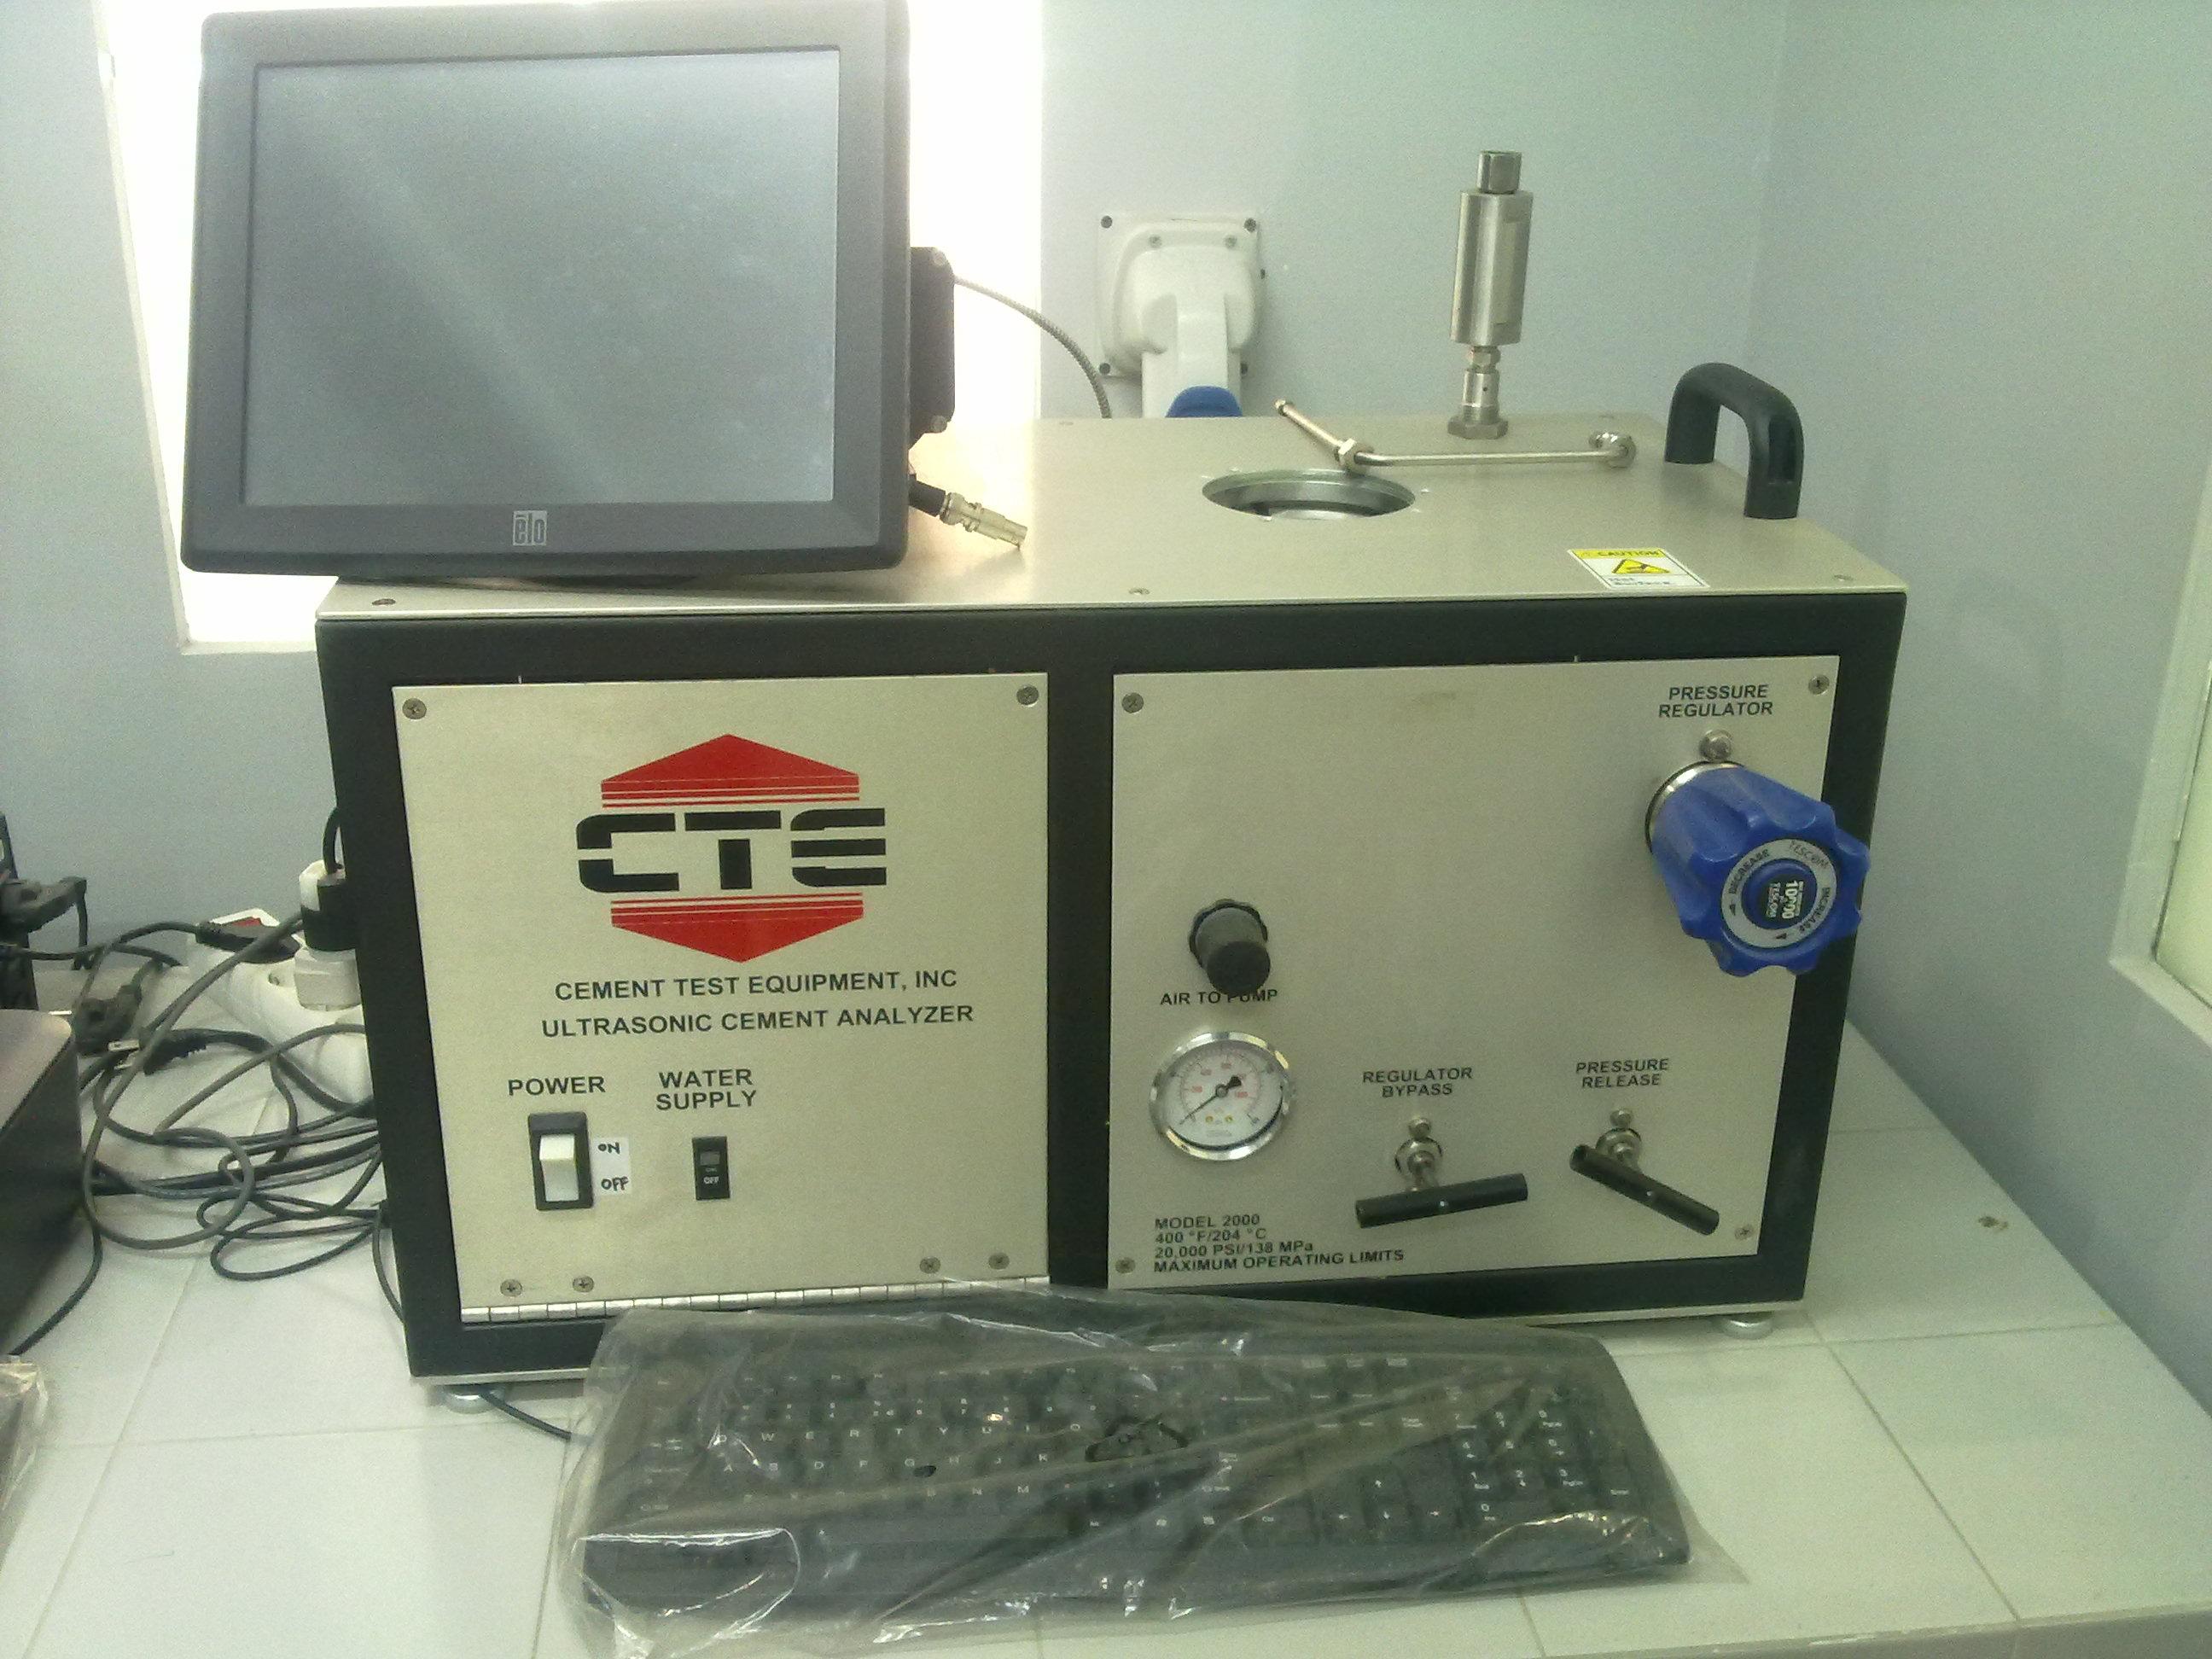 Ultrasonic Cement Analyzer (UCA)